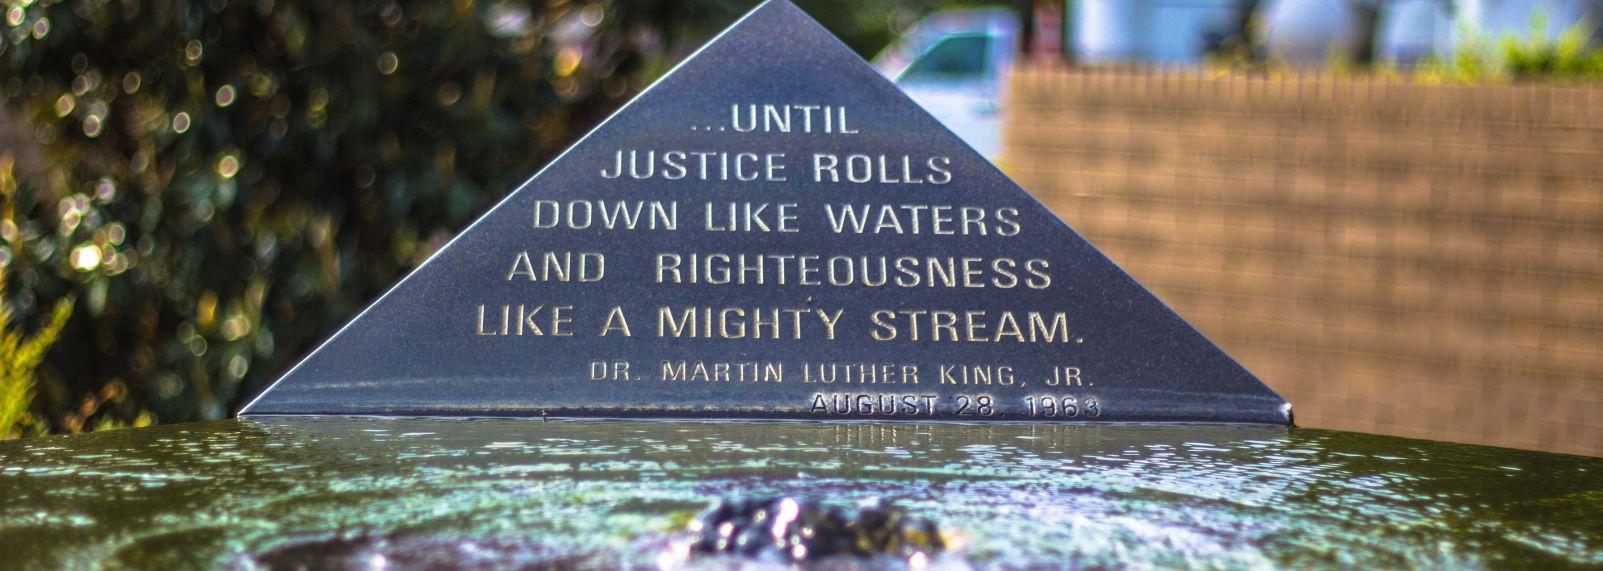 Martin Luther King Memorial Garden 01-101.jpg